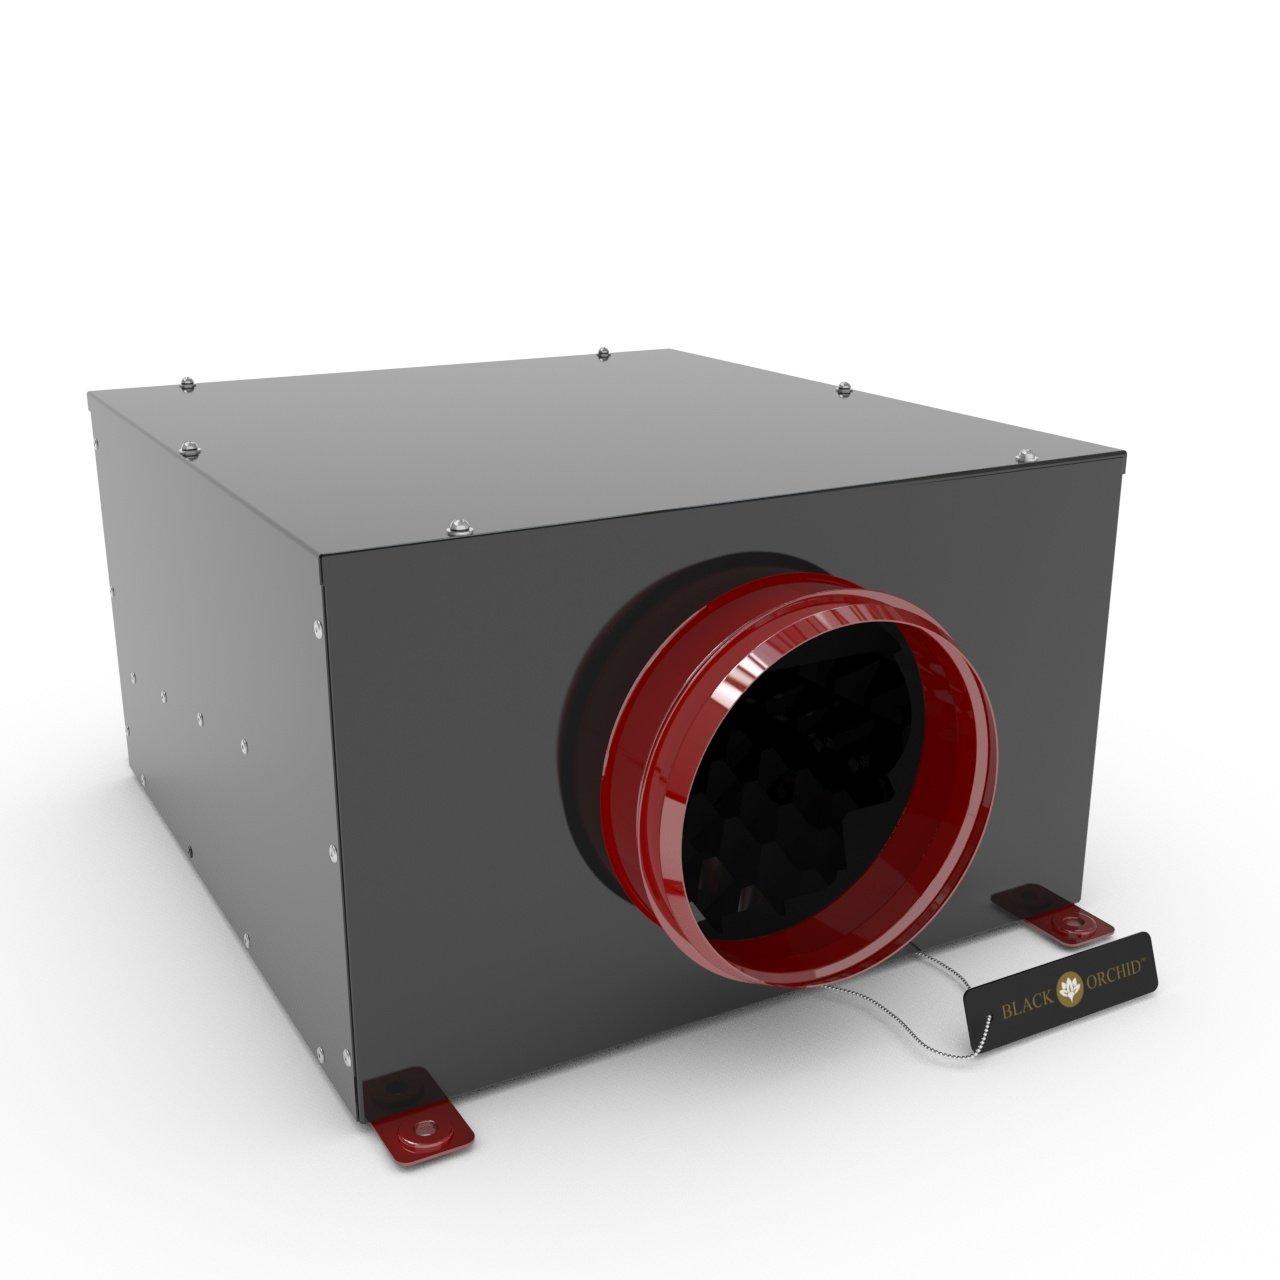 Black Orchid Silenta-Box in-Line Extractor Fan 4' Dia c/w UK Plug & Lead